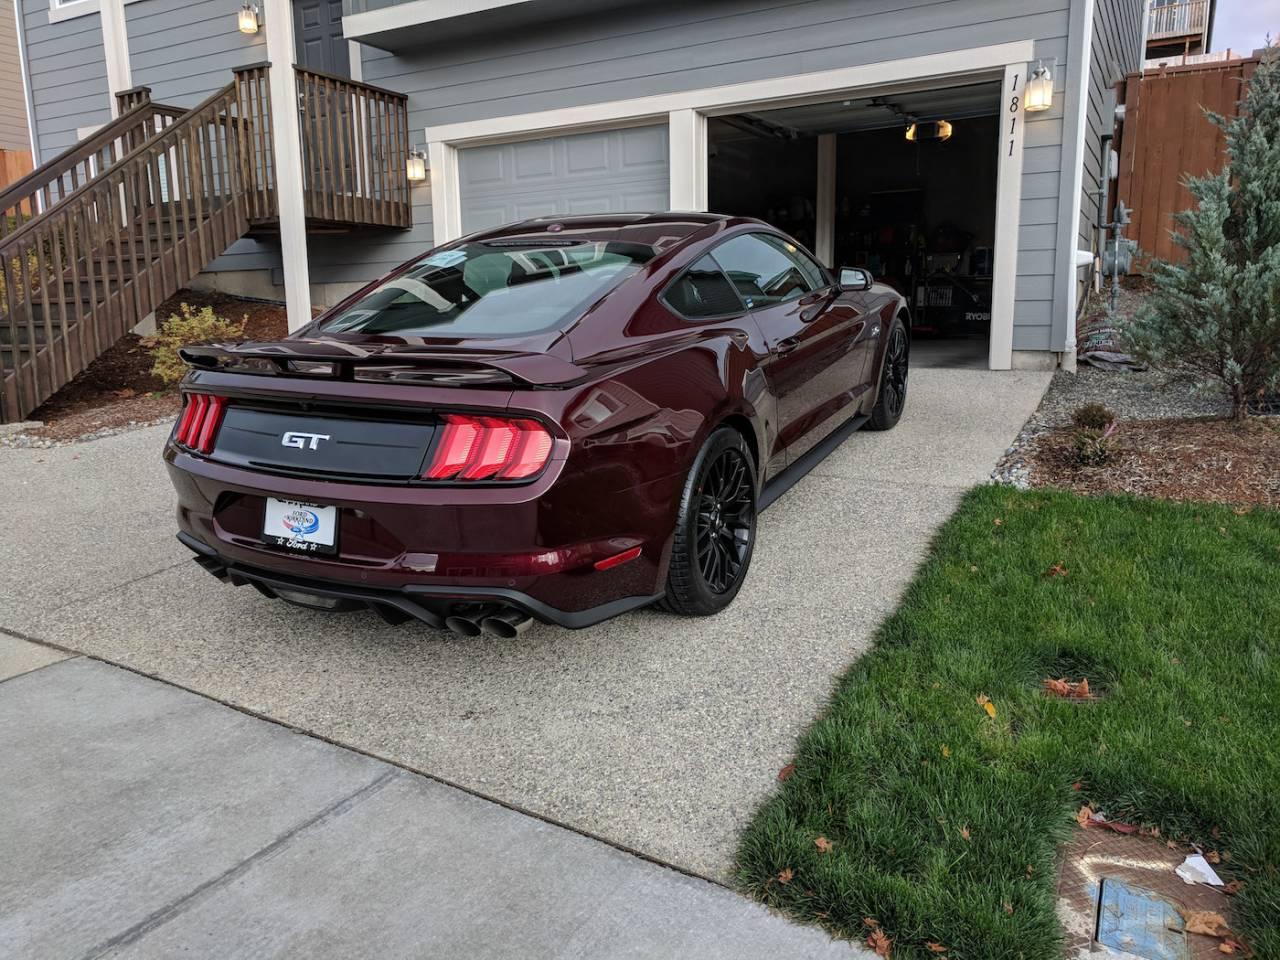 Mustang Gt Royal Crimson X on Dodge Ram 1500 Parts